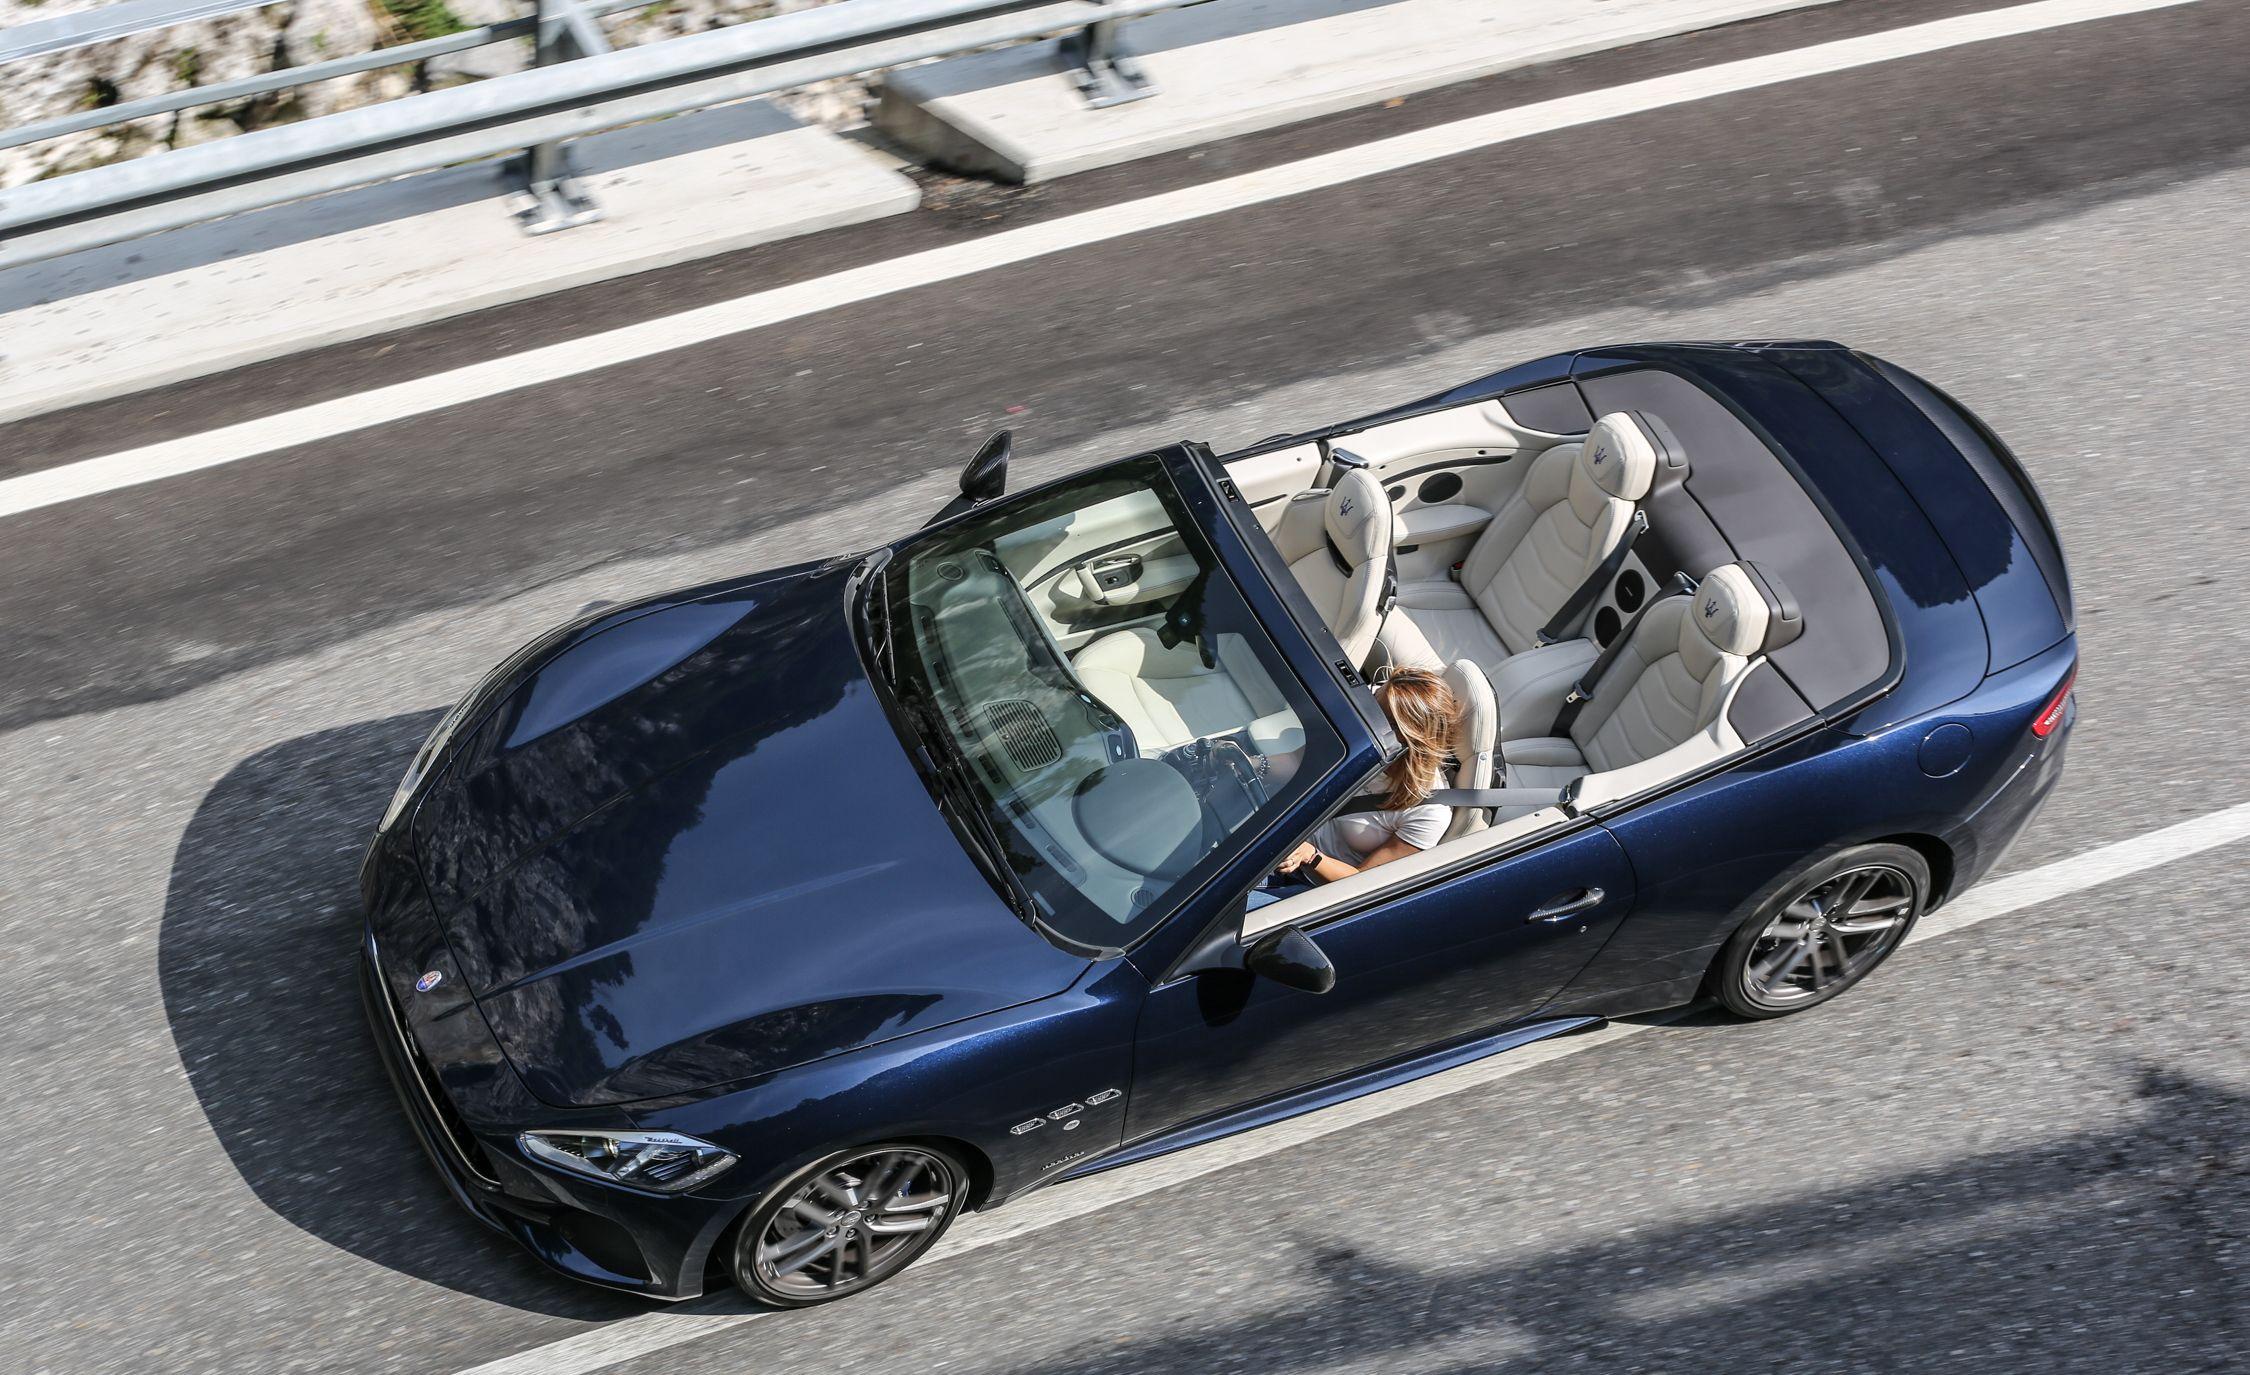 Maserati GranTurismo Reviews | Maserati GranTurismo Price, Photos, And  Specs | Car And Driver